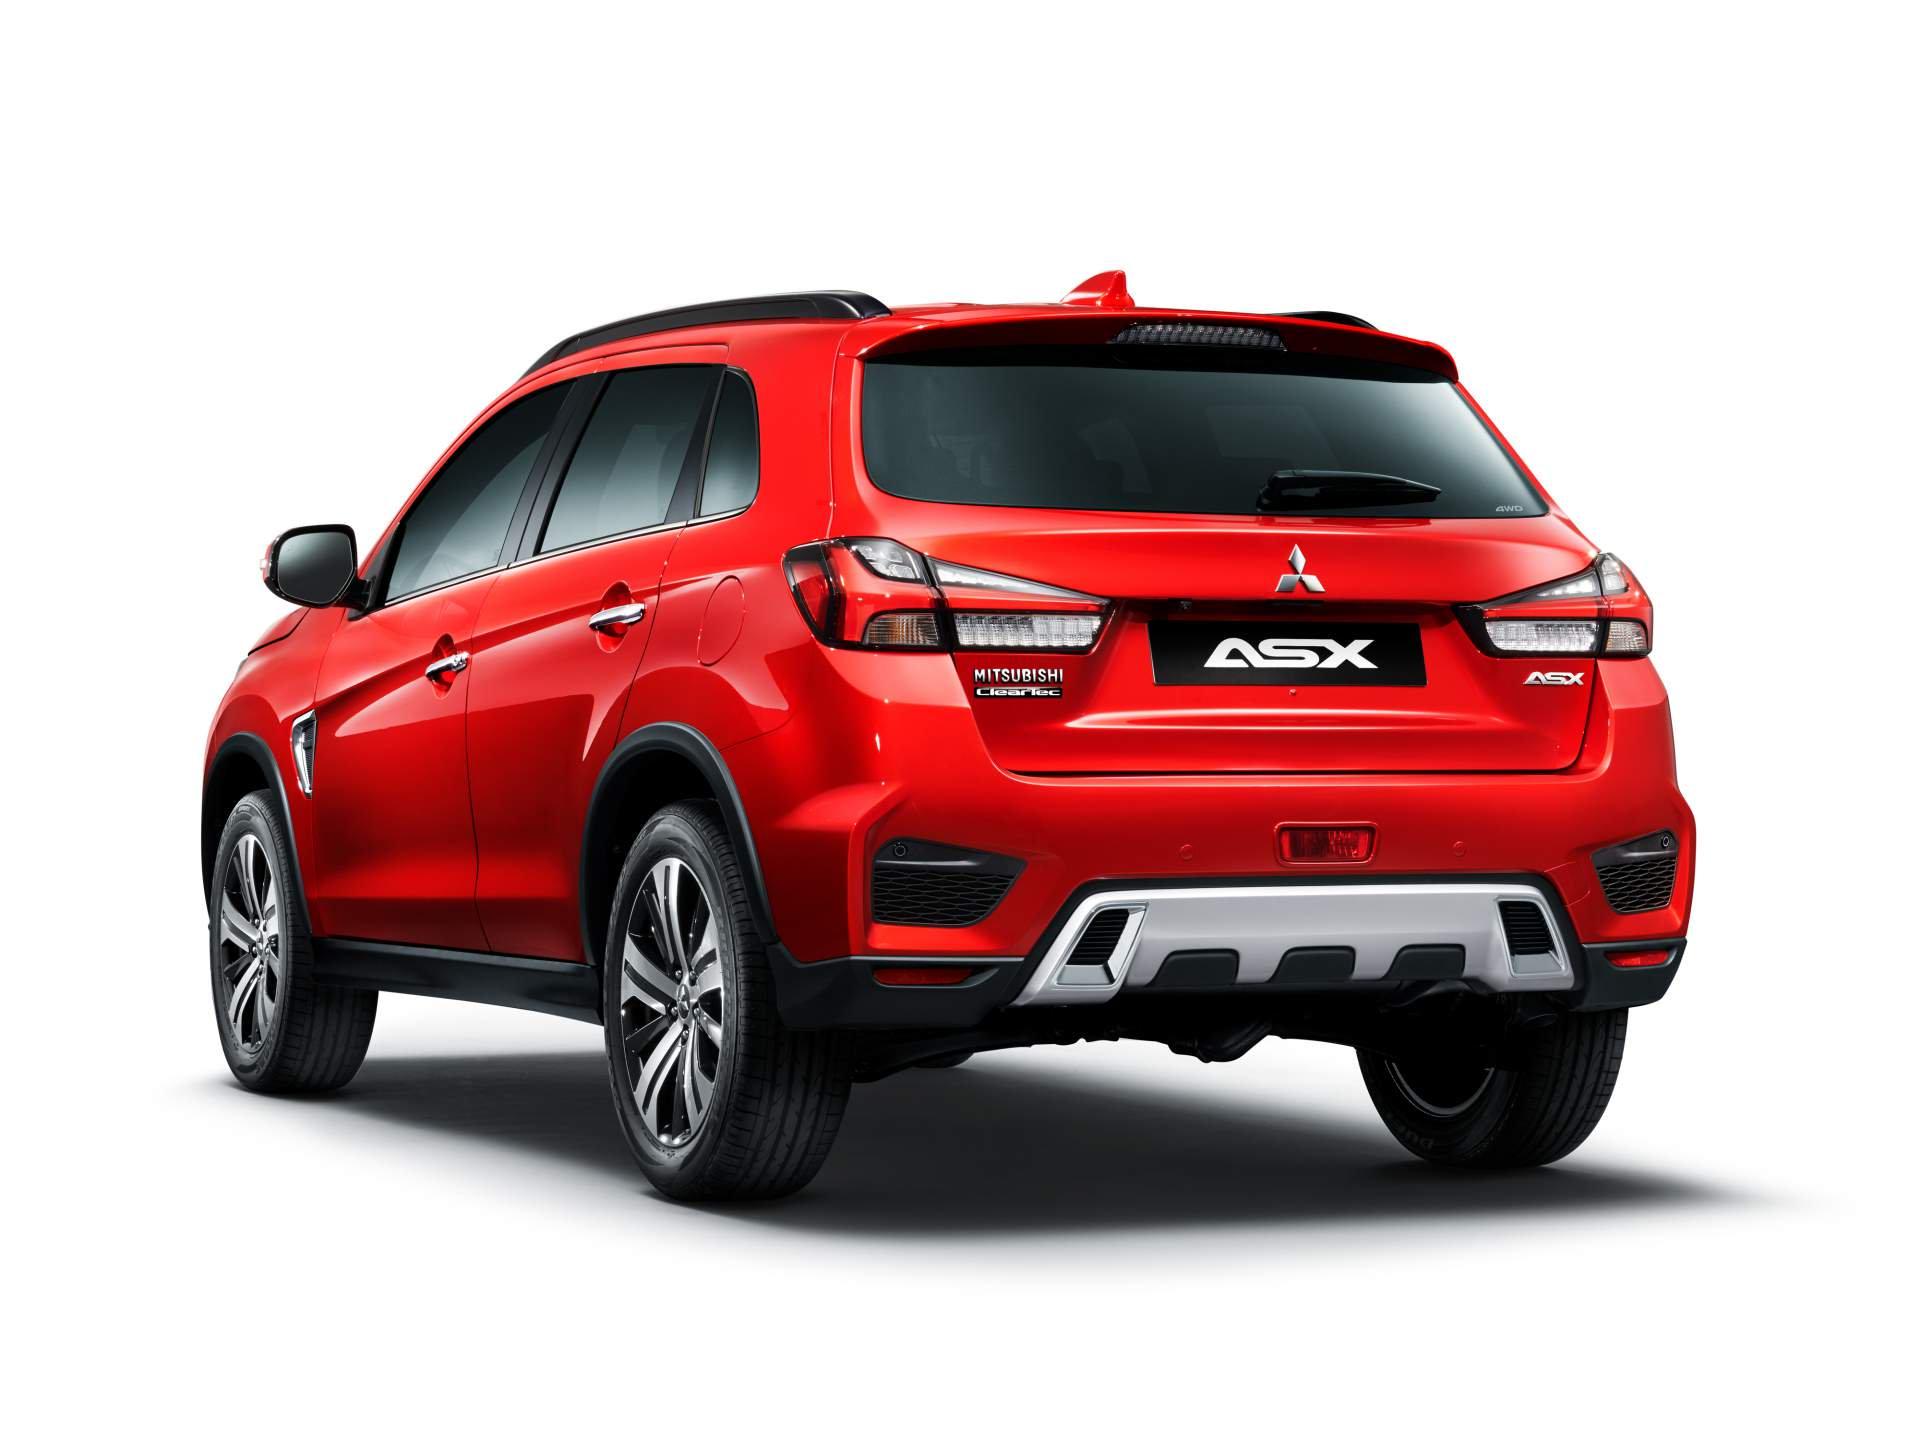 Mitsubishi ASX facelift 2019 (25)